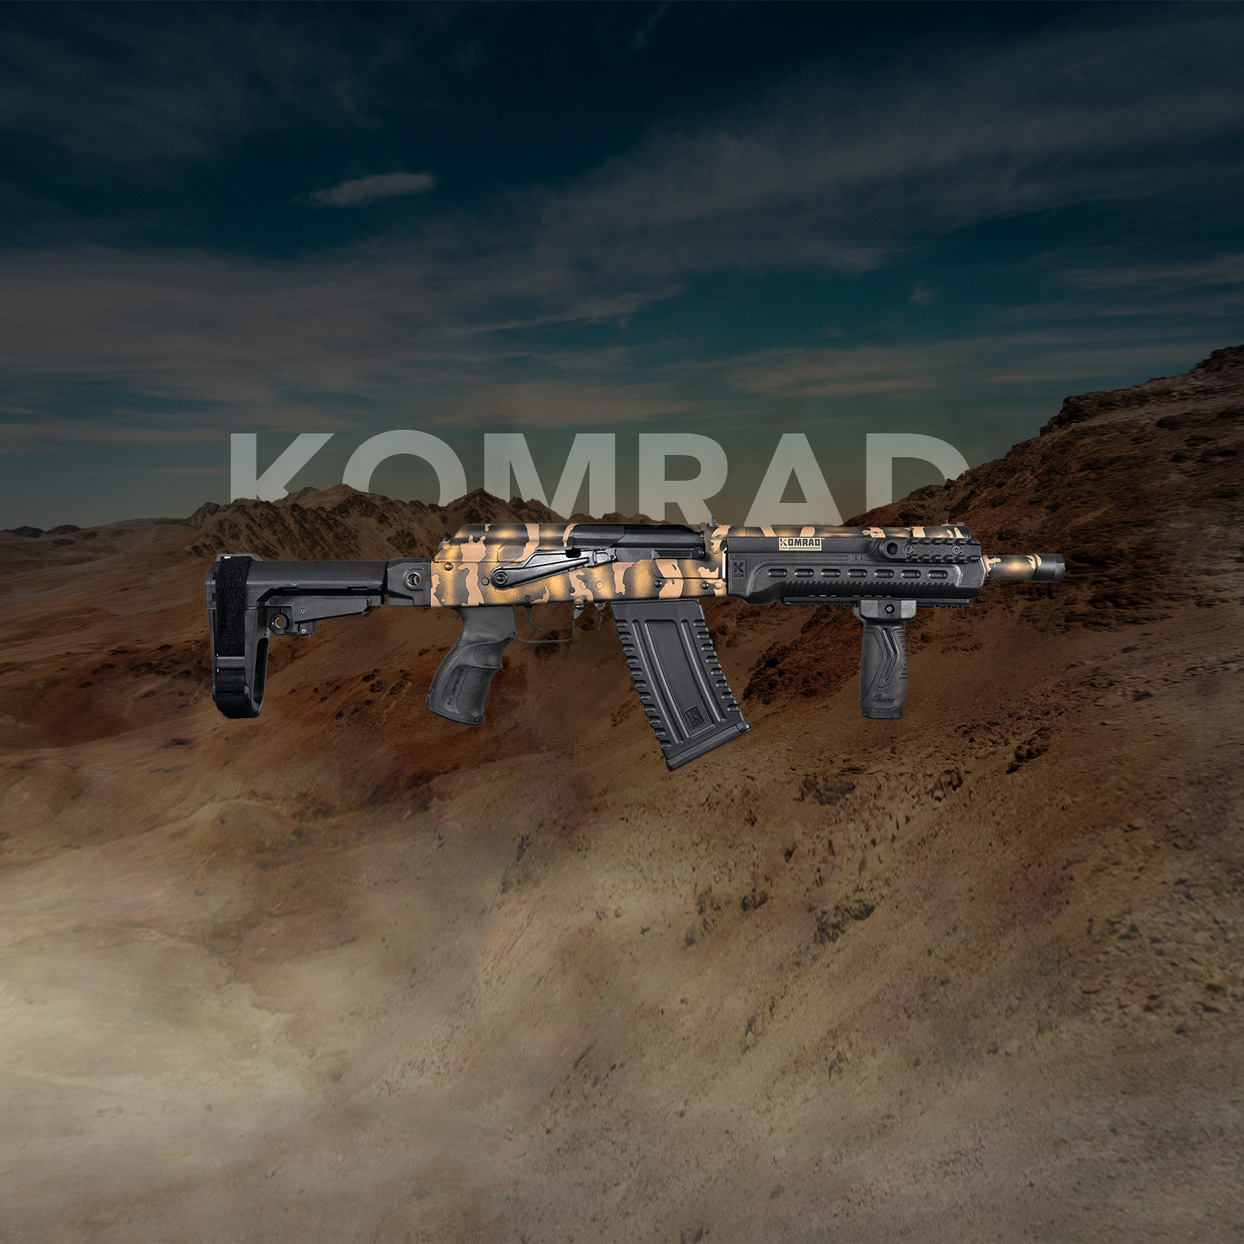 Kalashnikov Komrad Rifle